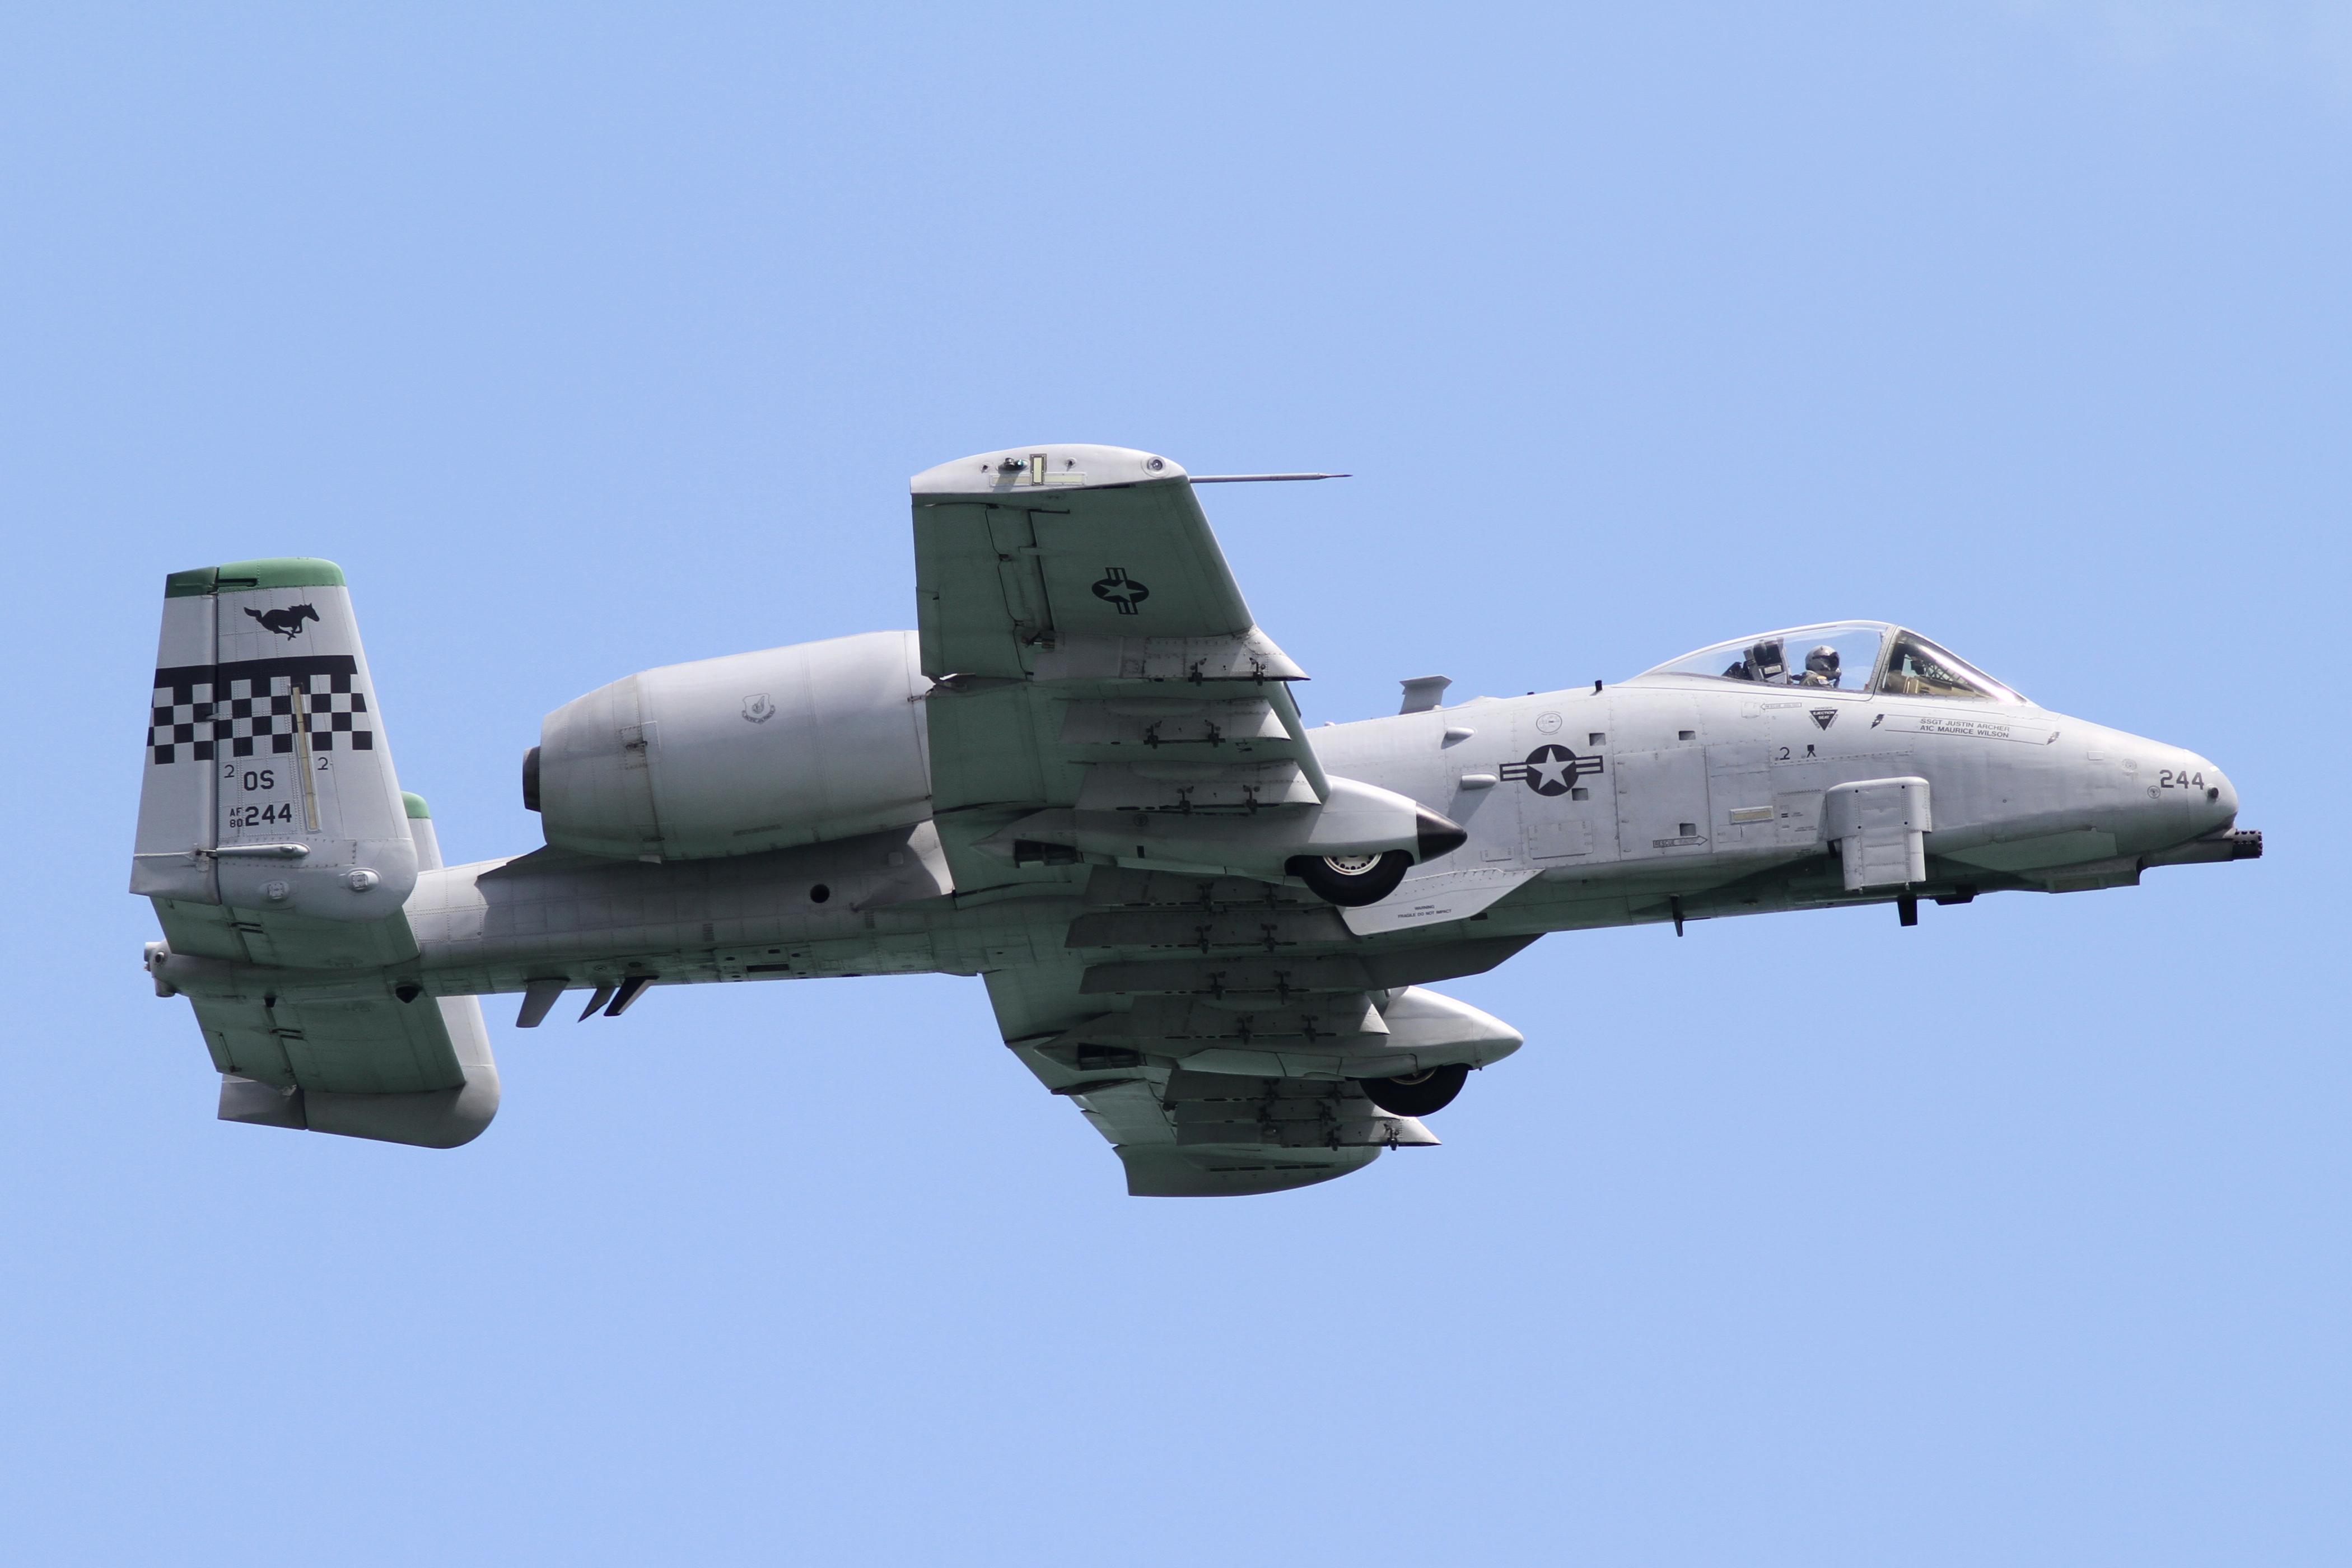 Fairchild Republic A10 Thunderbolt II  Wikipedia